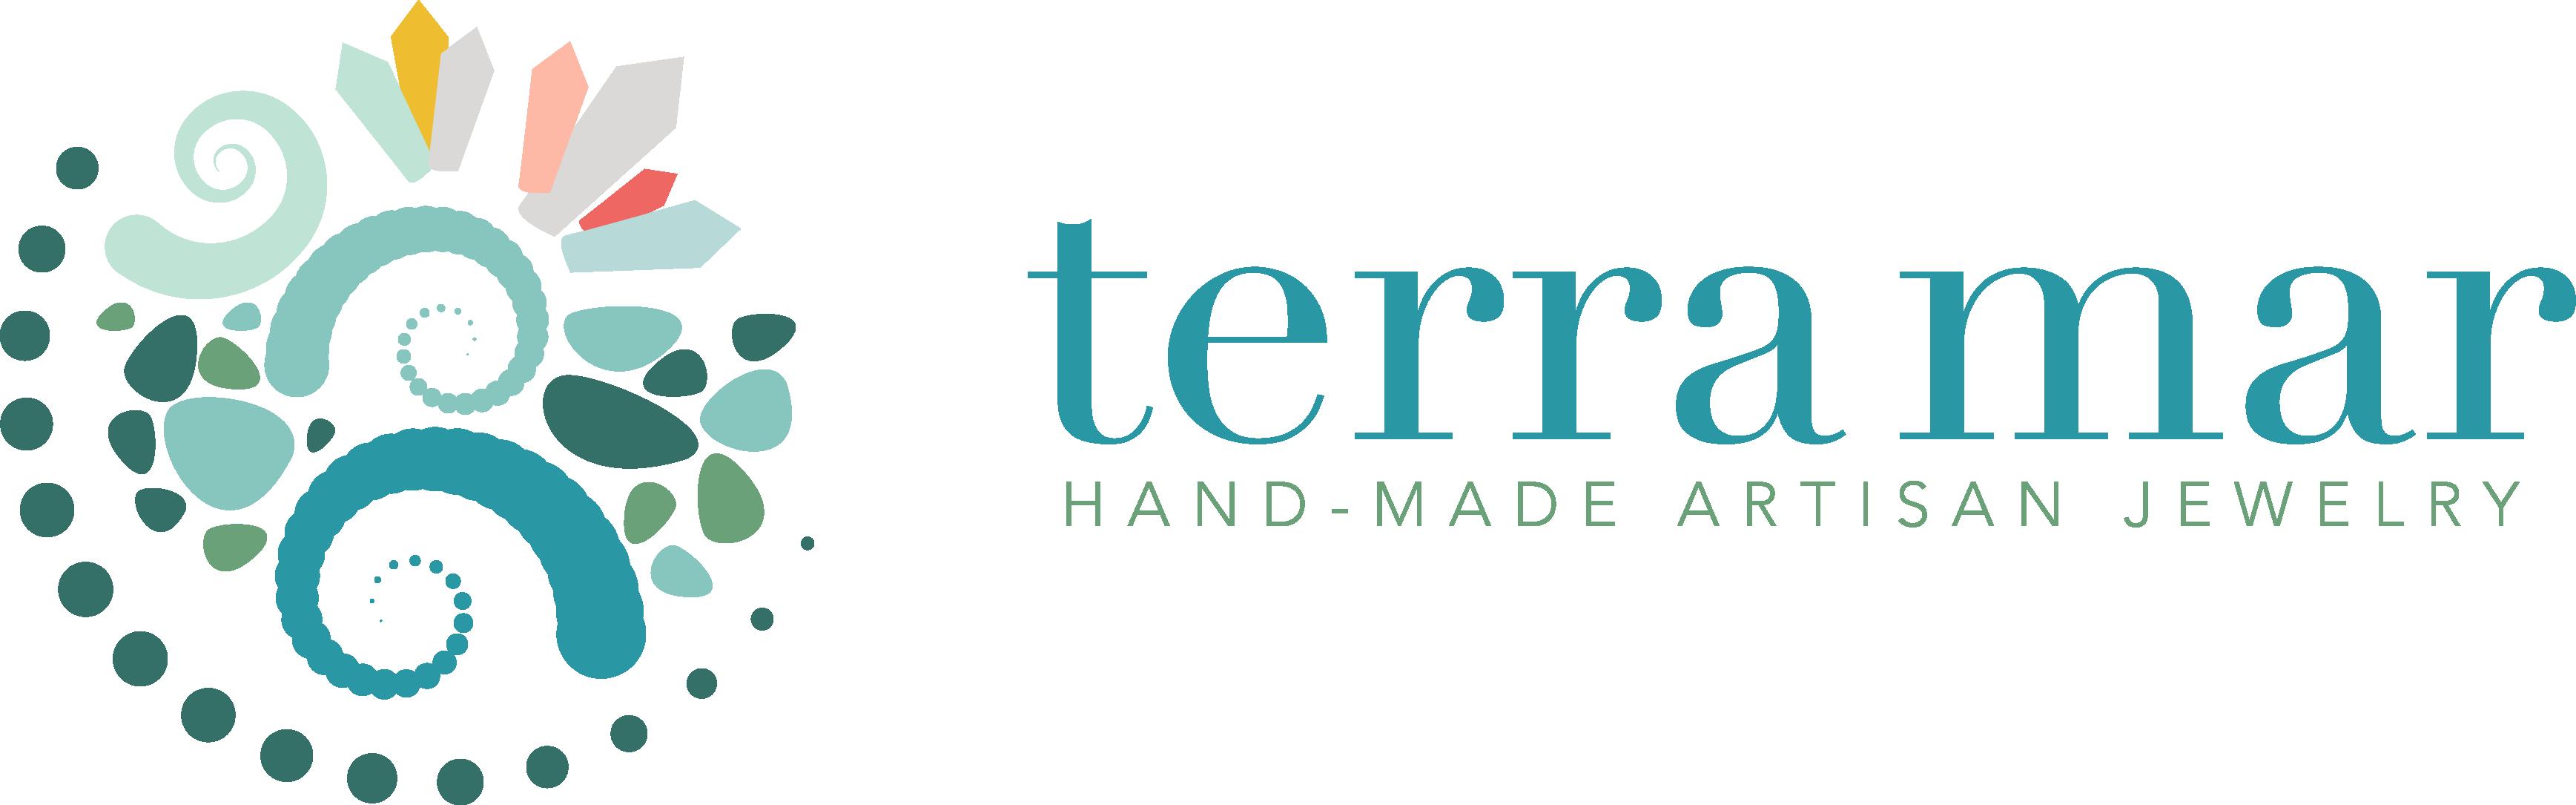 Terra Mar Jewelry